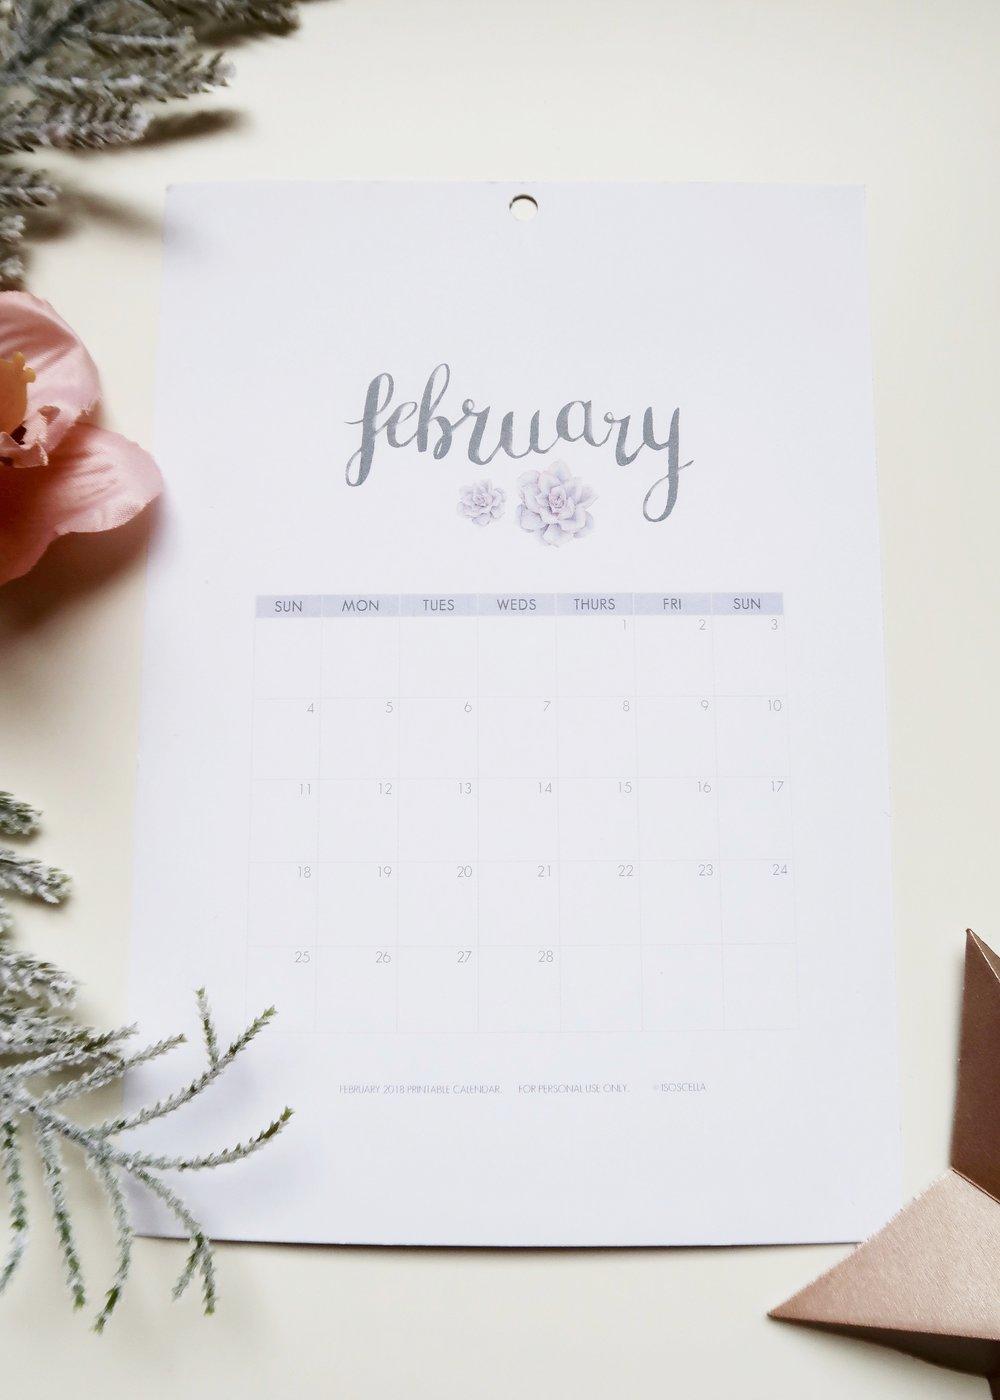 Printable February 2018 Calendar by Isoscella